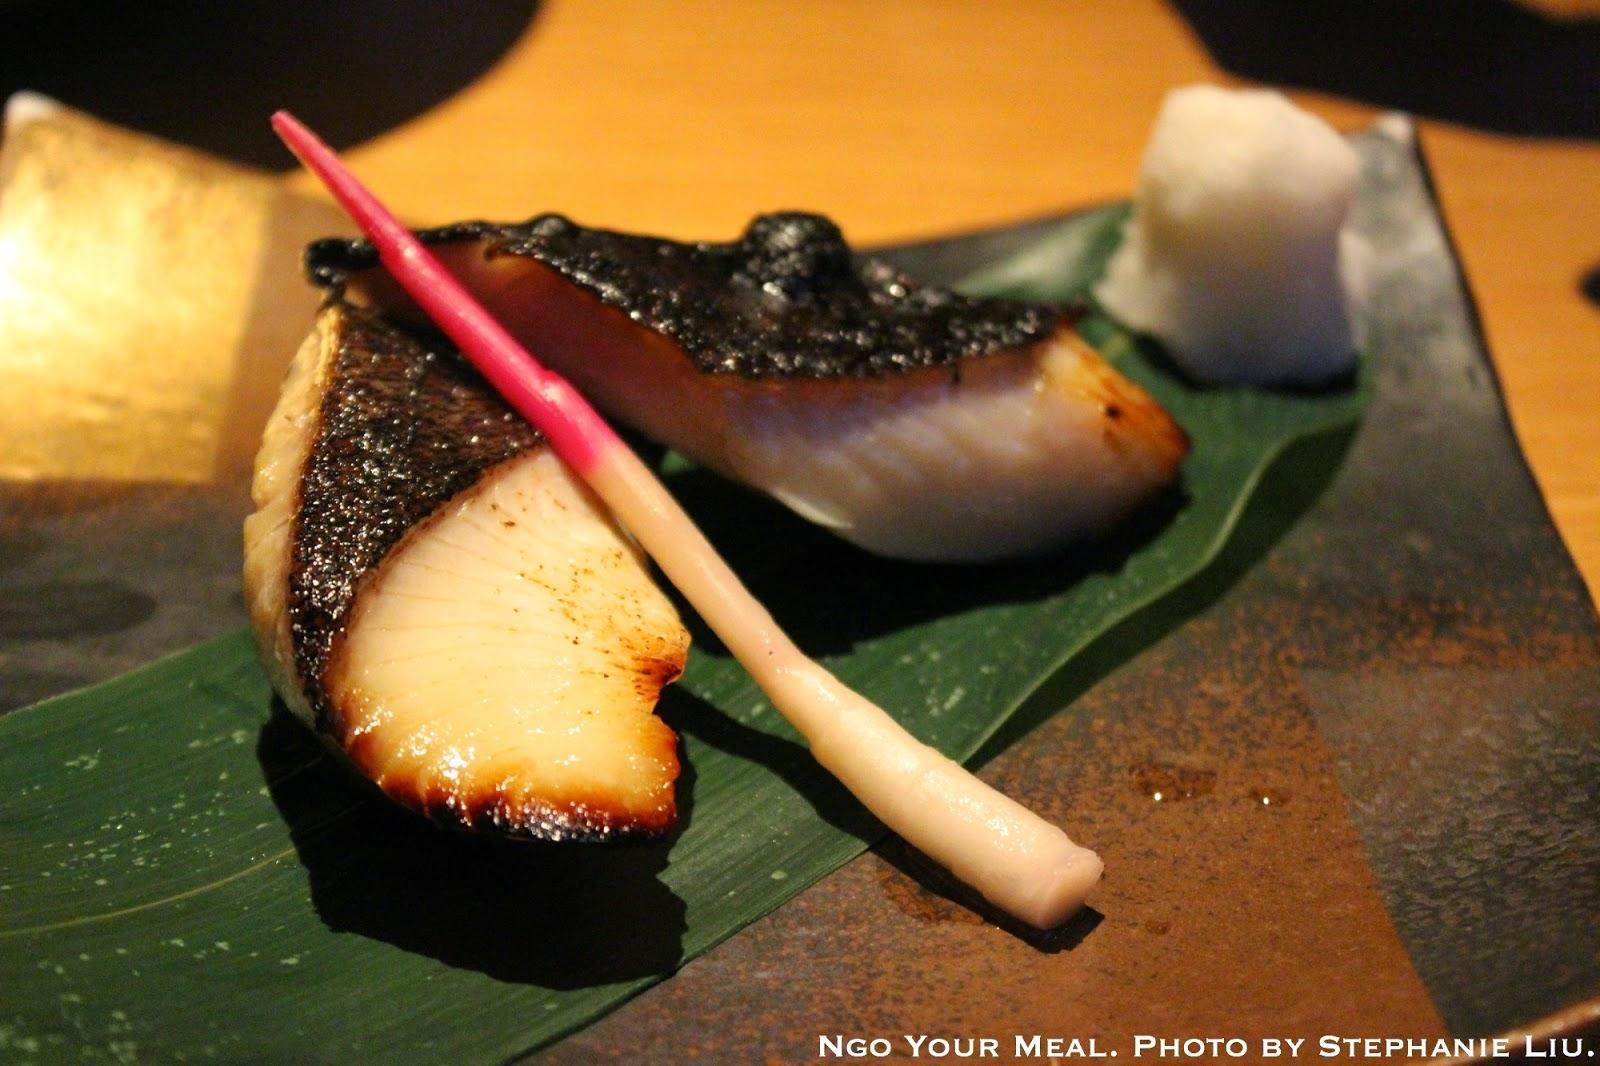 Saikyo Miso Black Cod: From Alaska marinated in saikyo miso, broiled at EN Japanese Brasserie